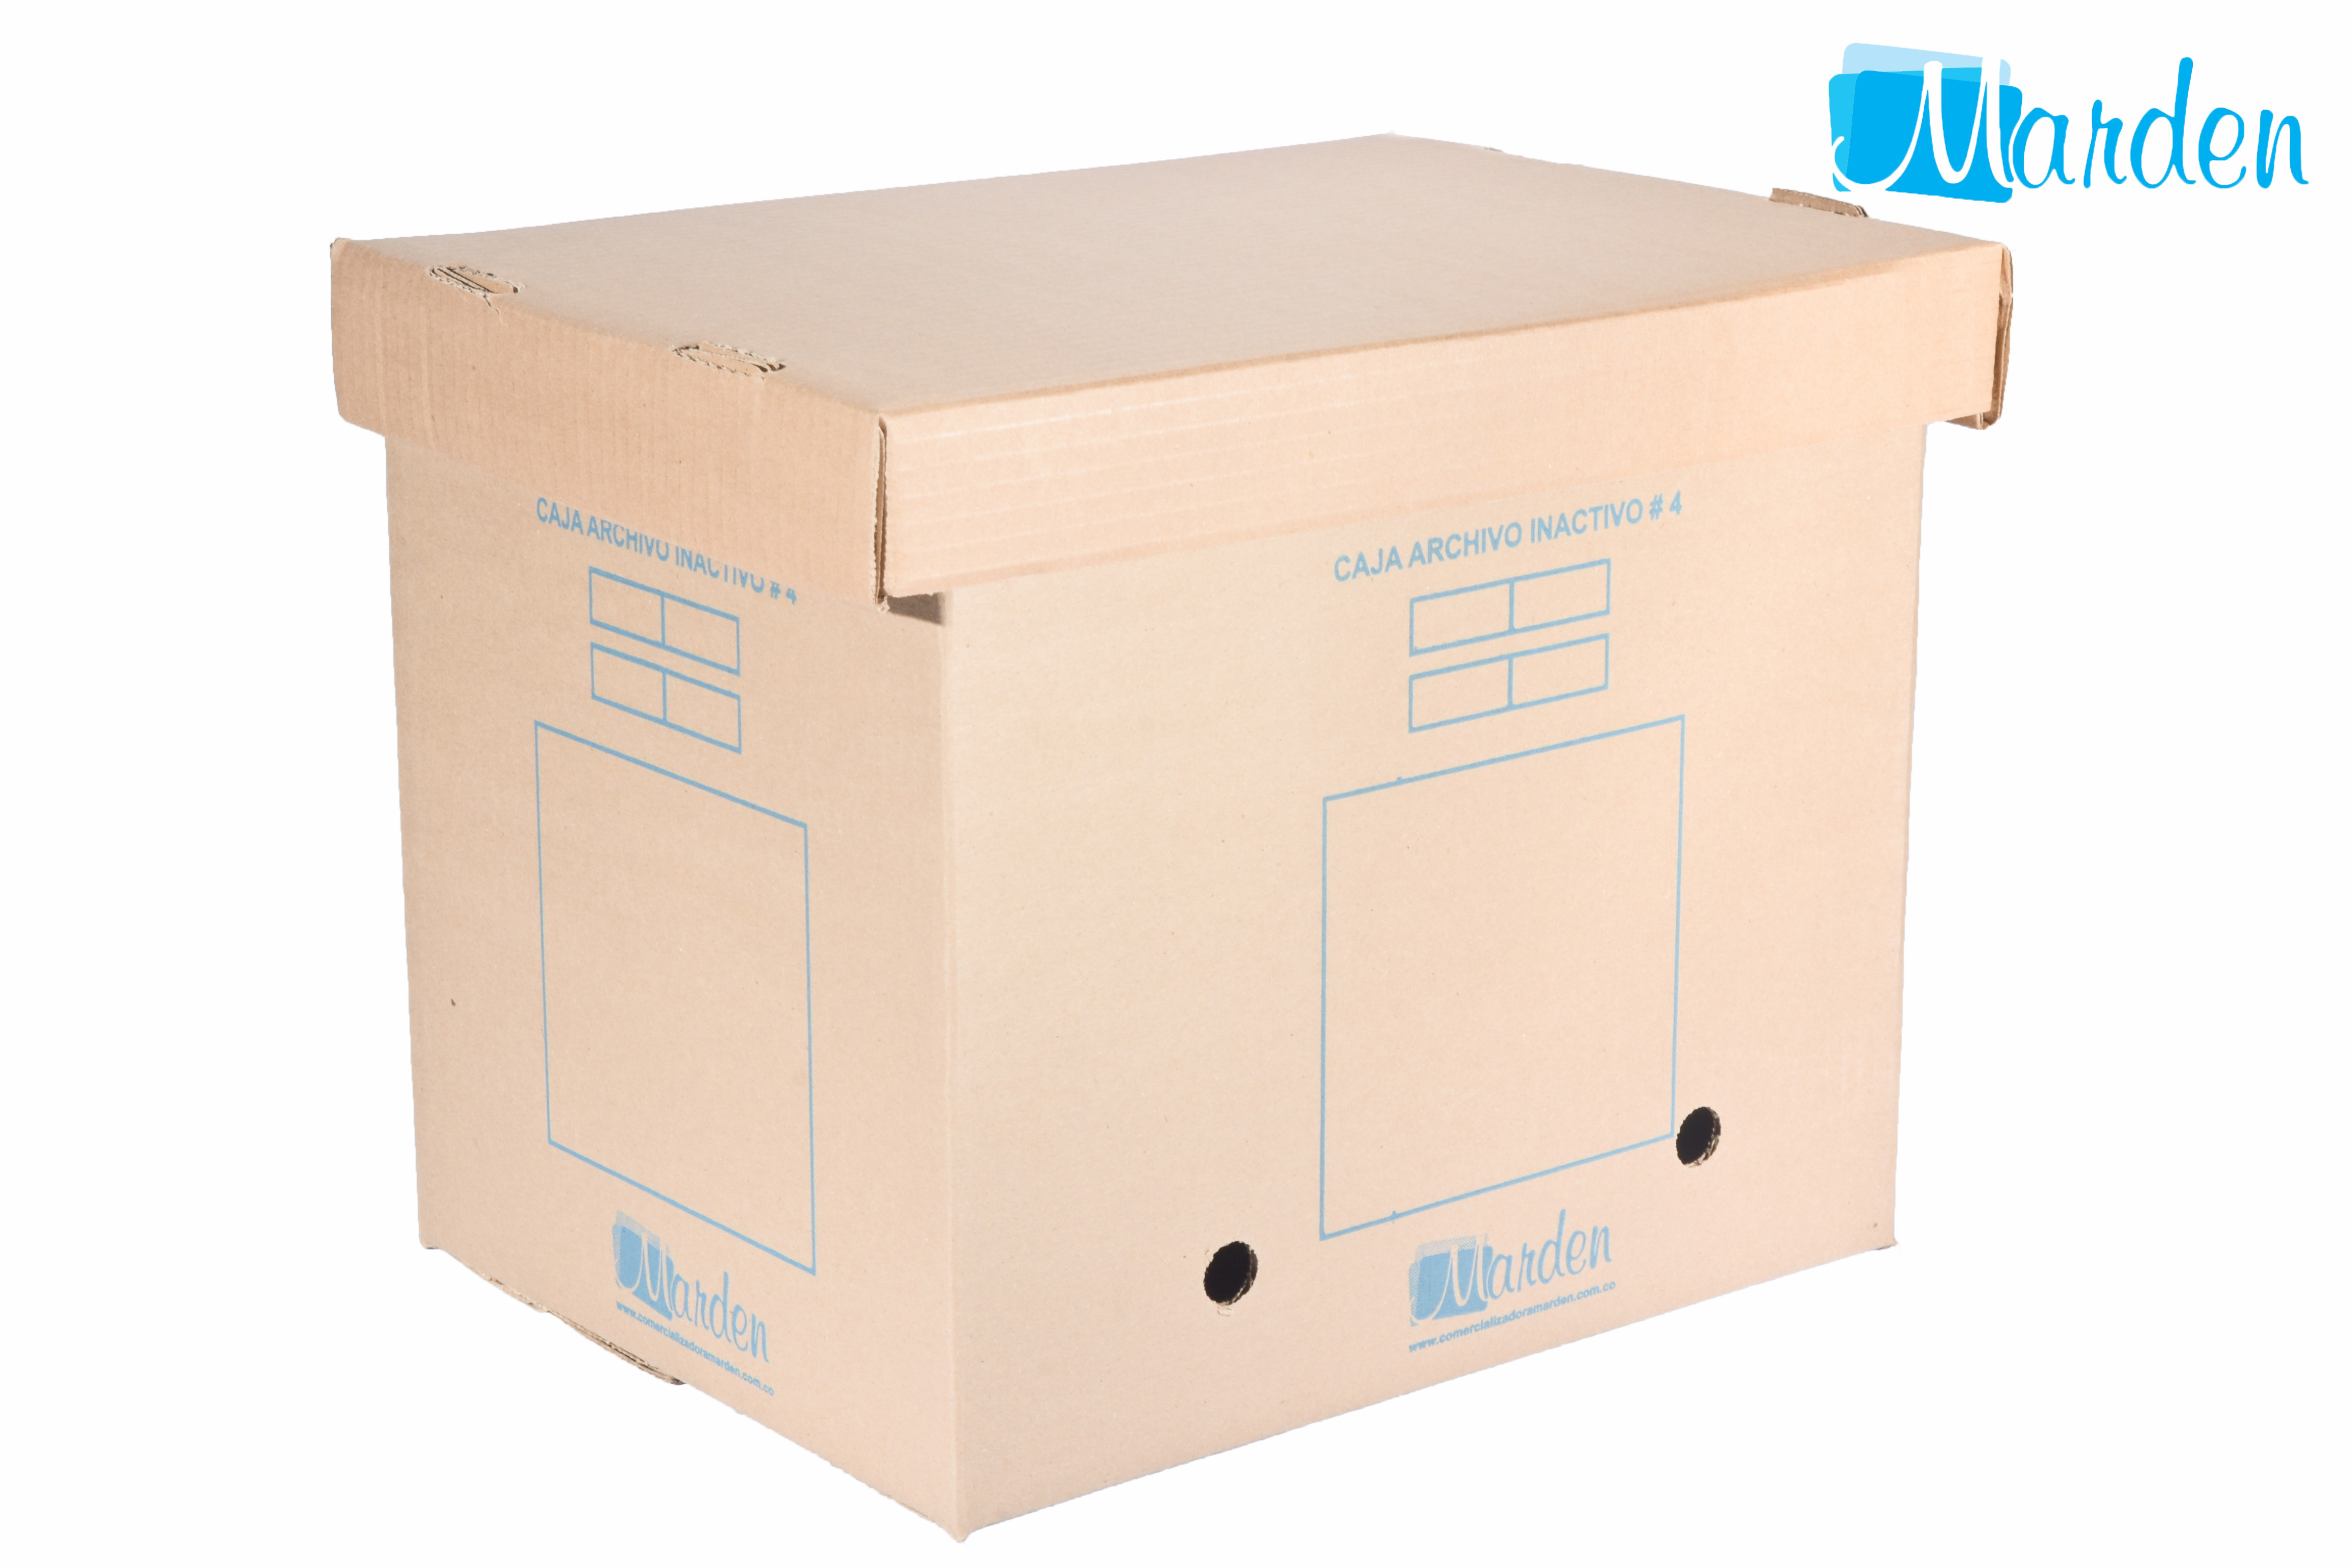 Caja archivo inactivo